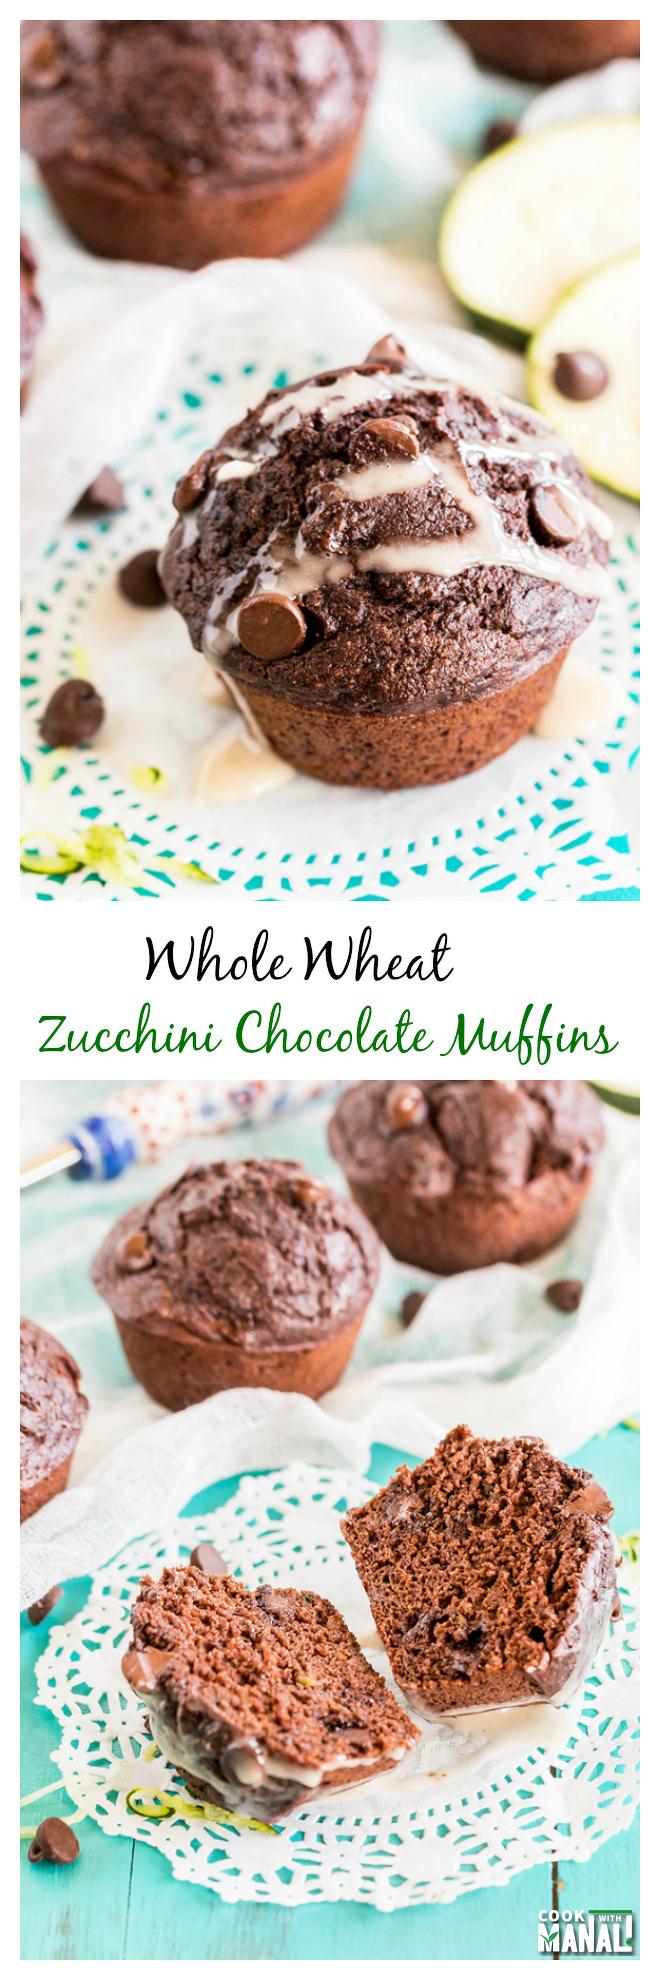 Zucchini Chocolate Muffins Collage